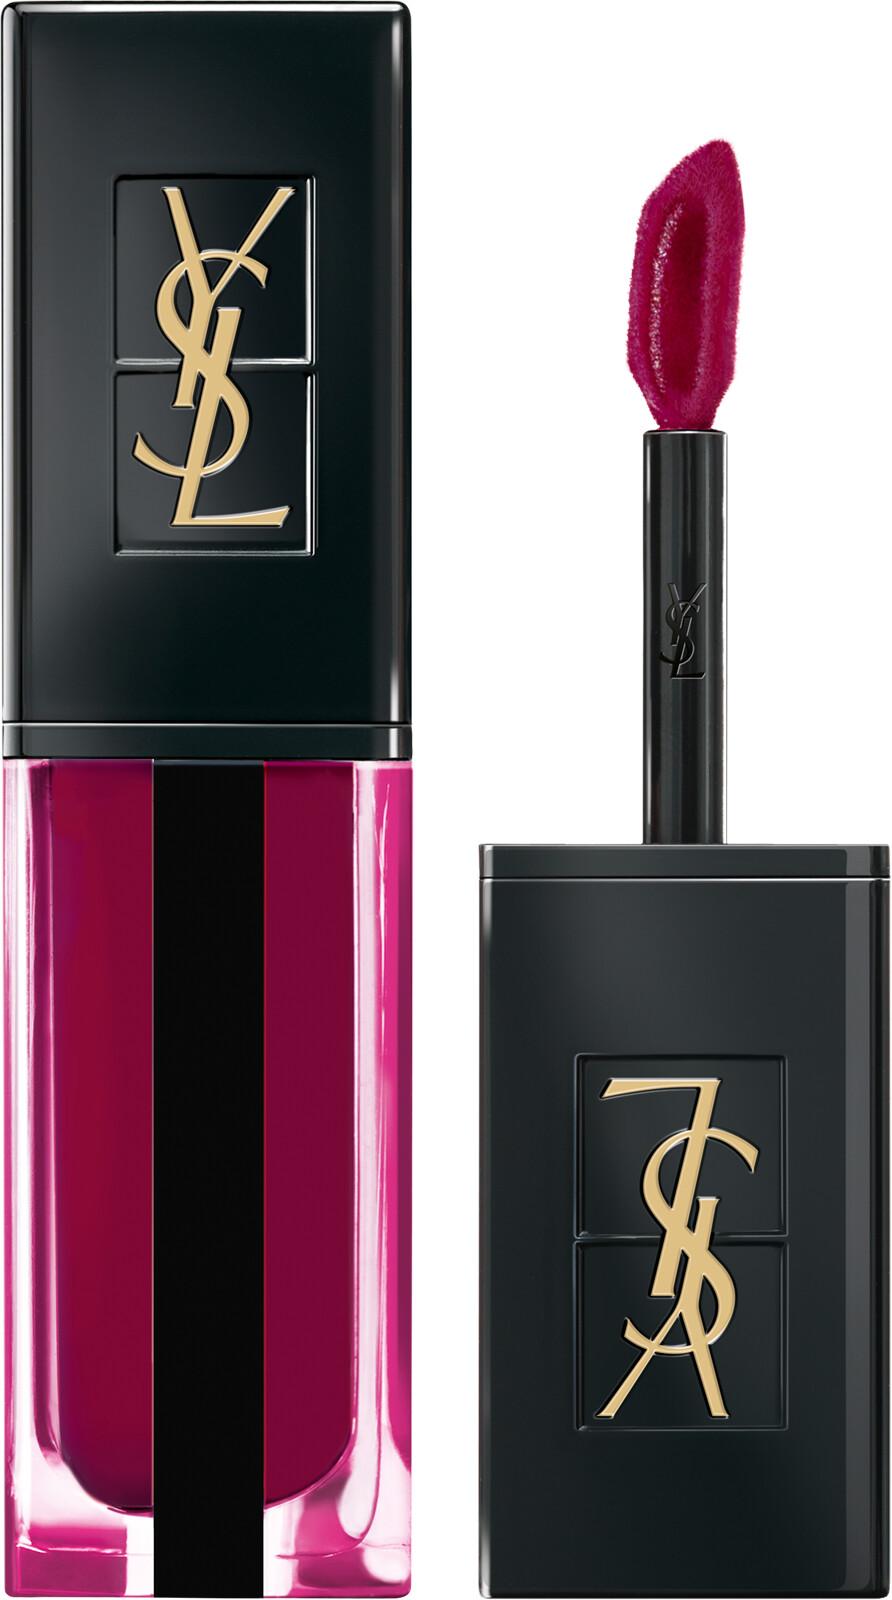 Yves Saint Laurent Vernis A Levres Water Lip Stain